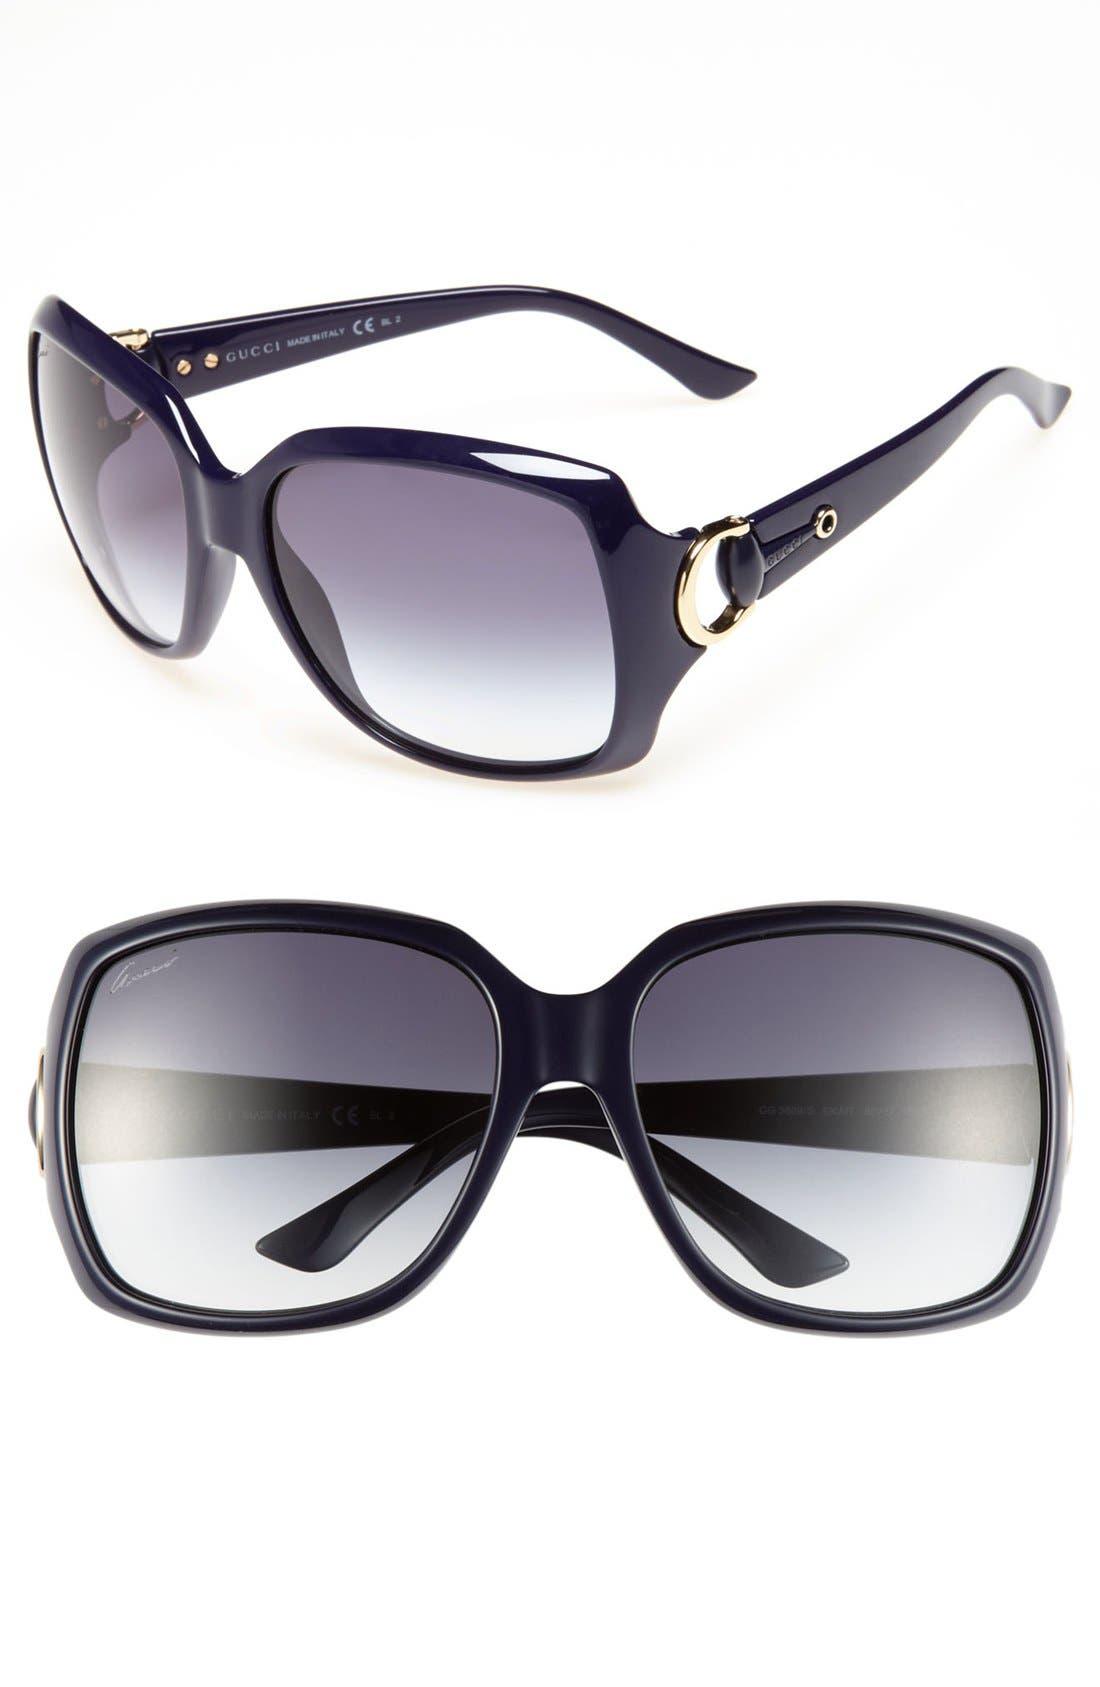 Main Image - Gucci 60mm Sunglasses